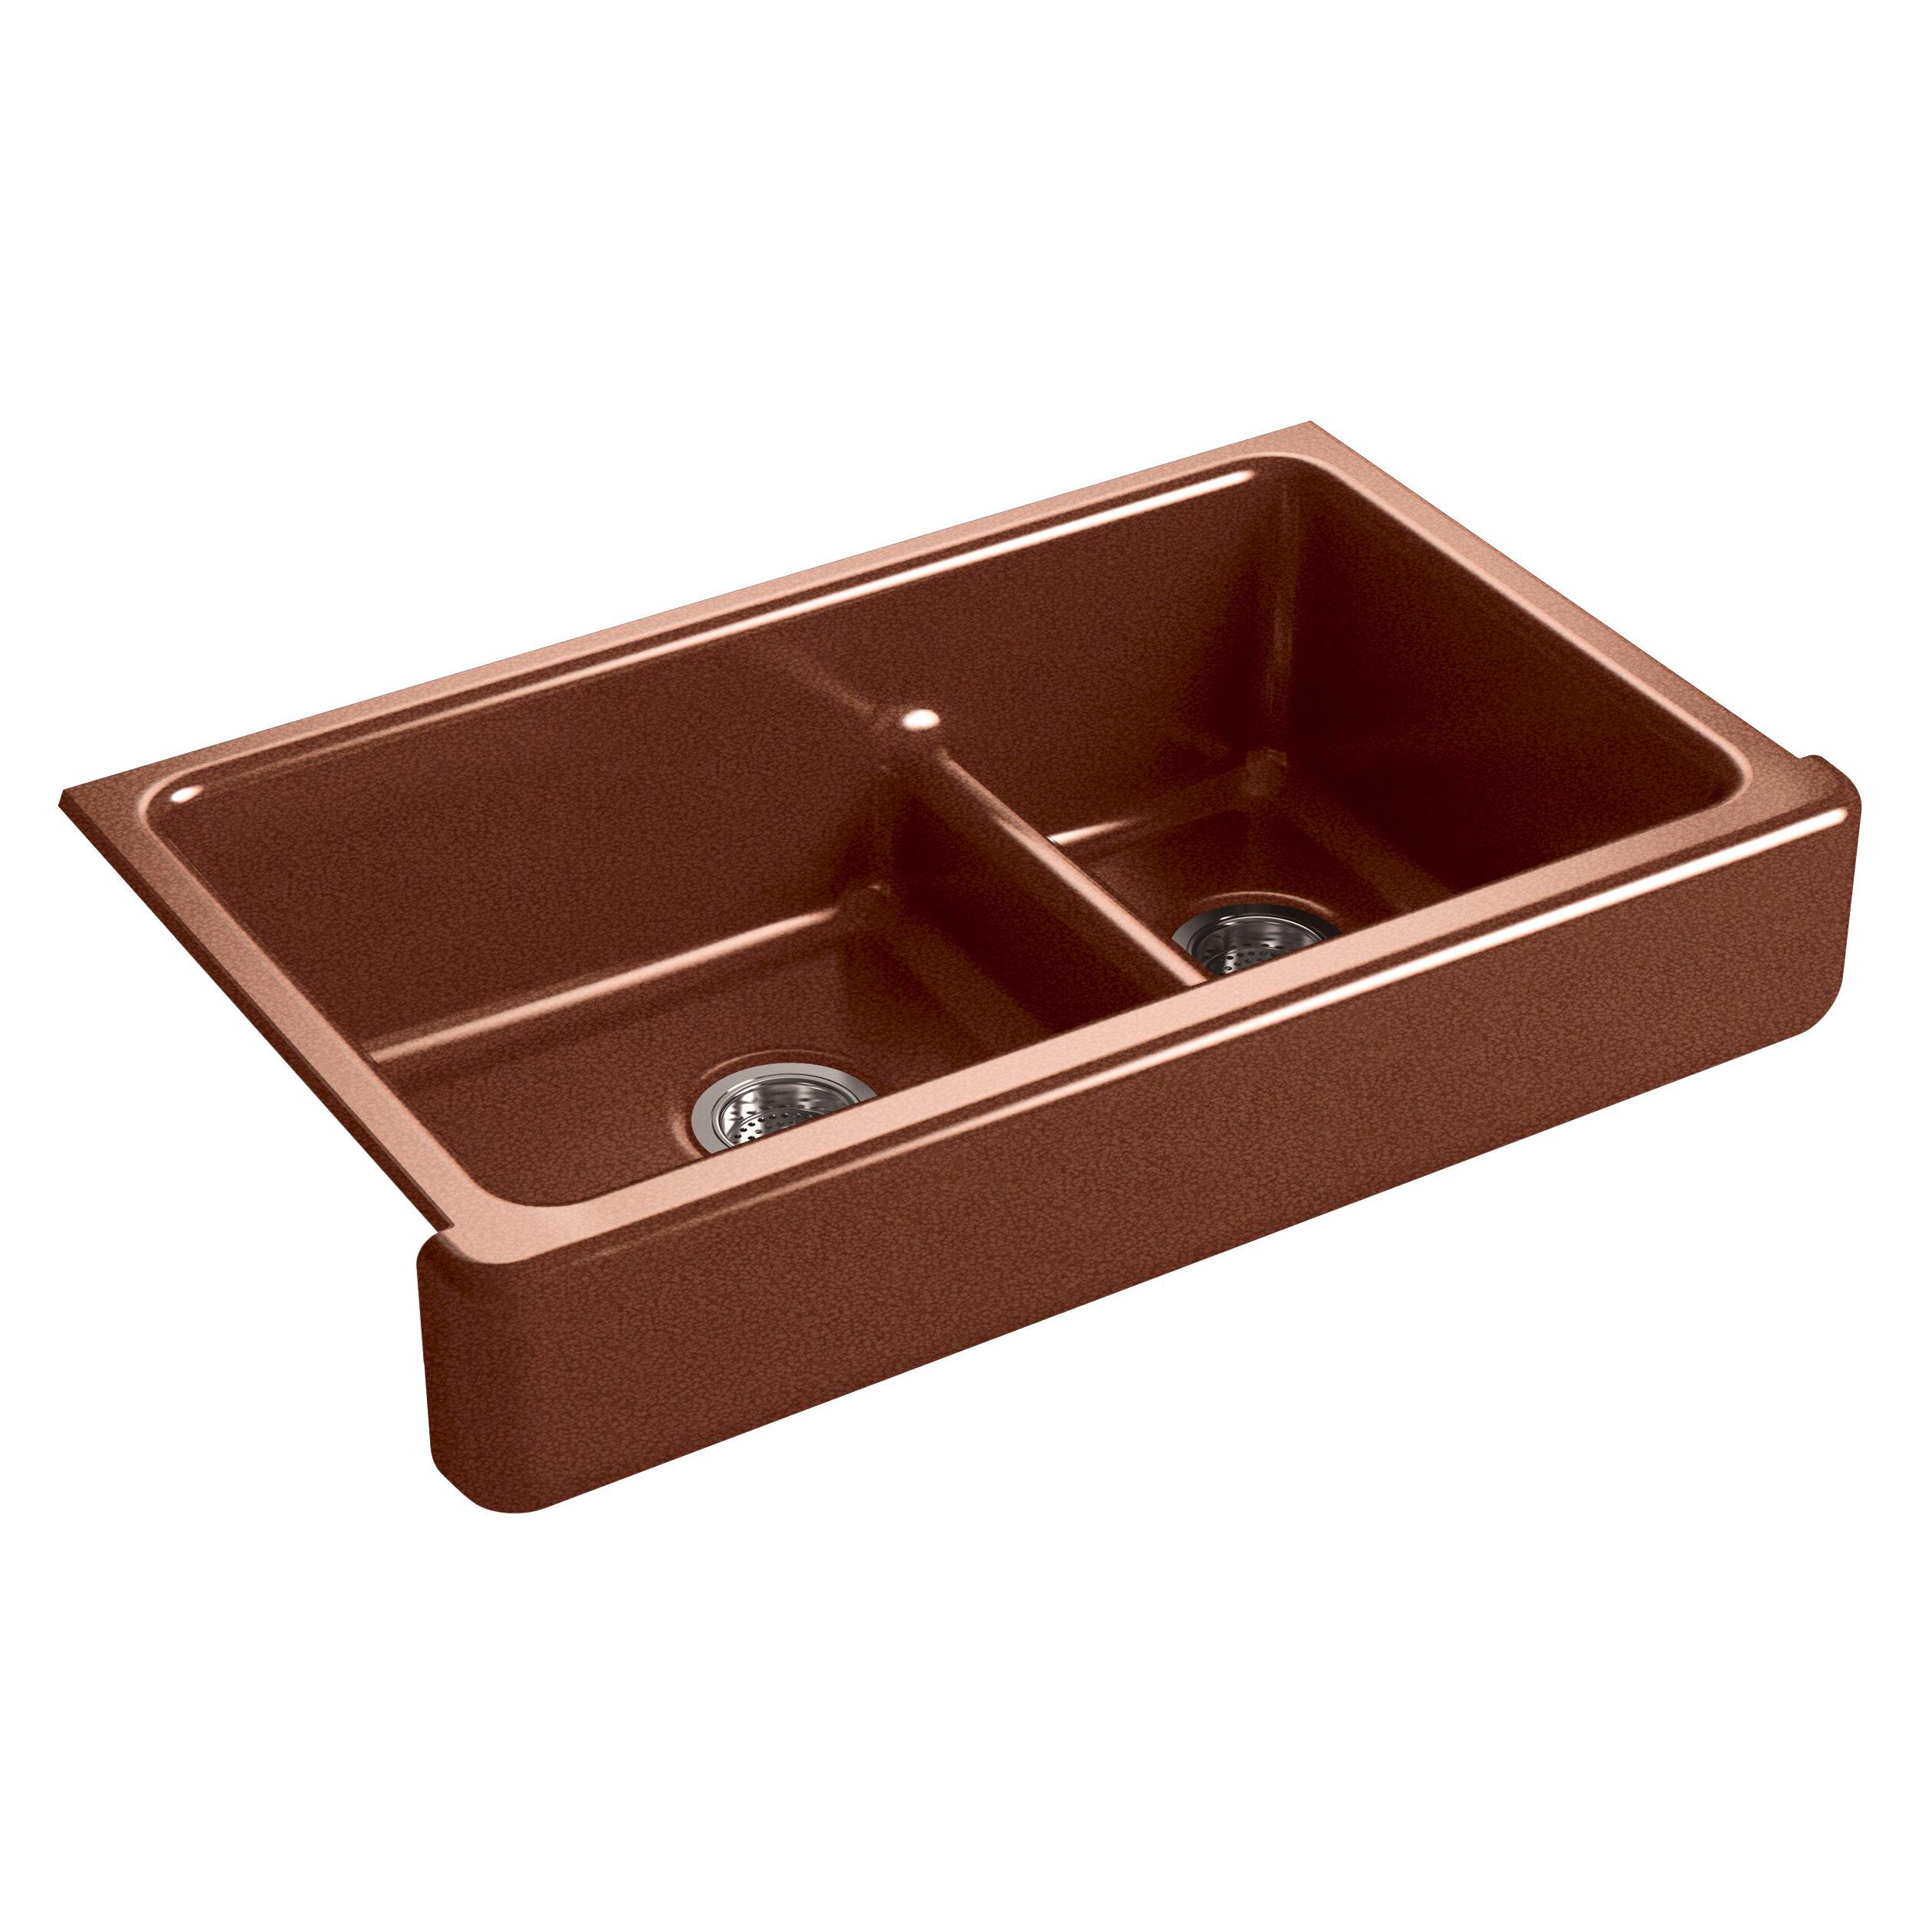 Kohler Sink Mats : ... Mount Large/Medium Double-Bowl Kitchen Sink with Short Apron by Kohler